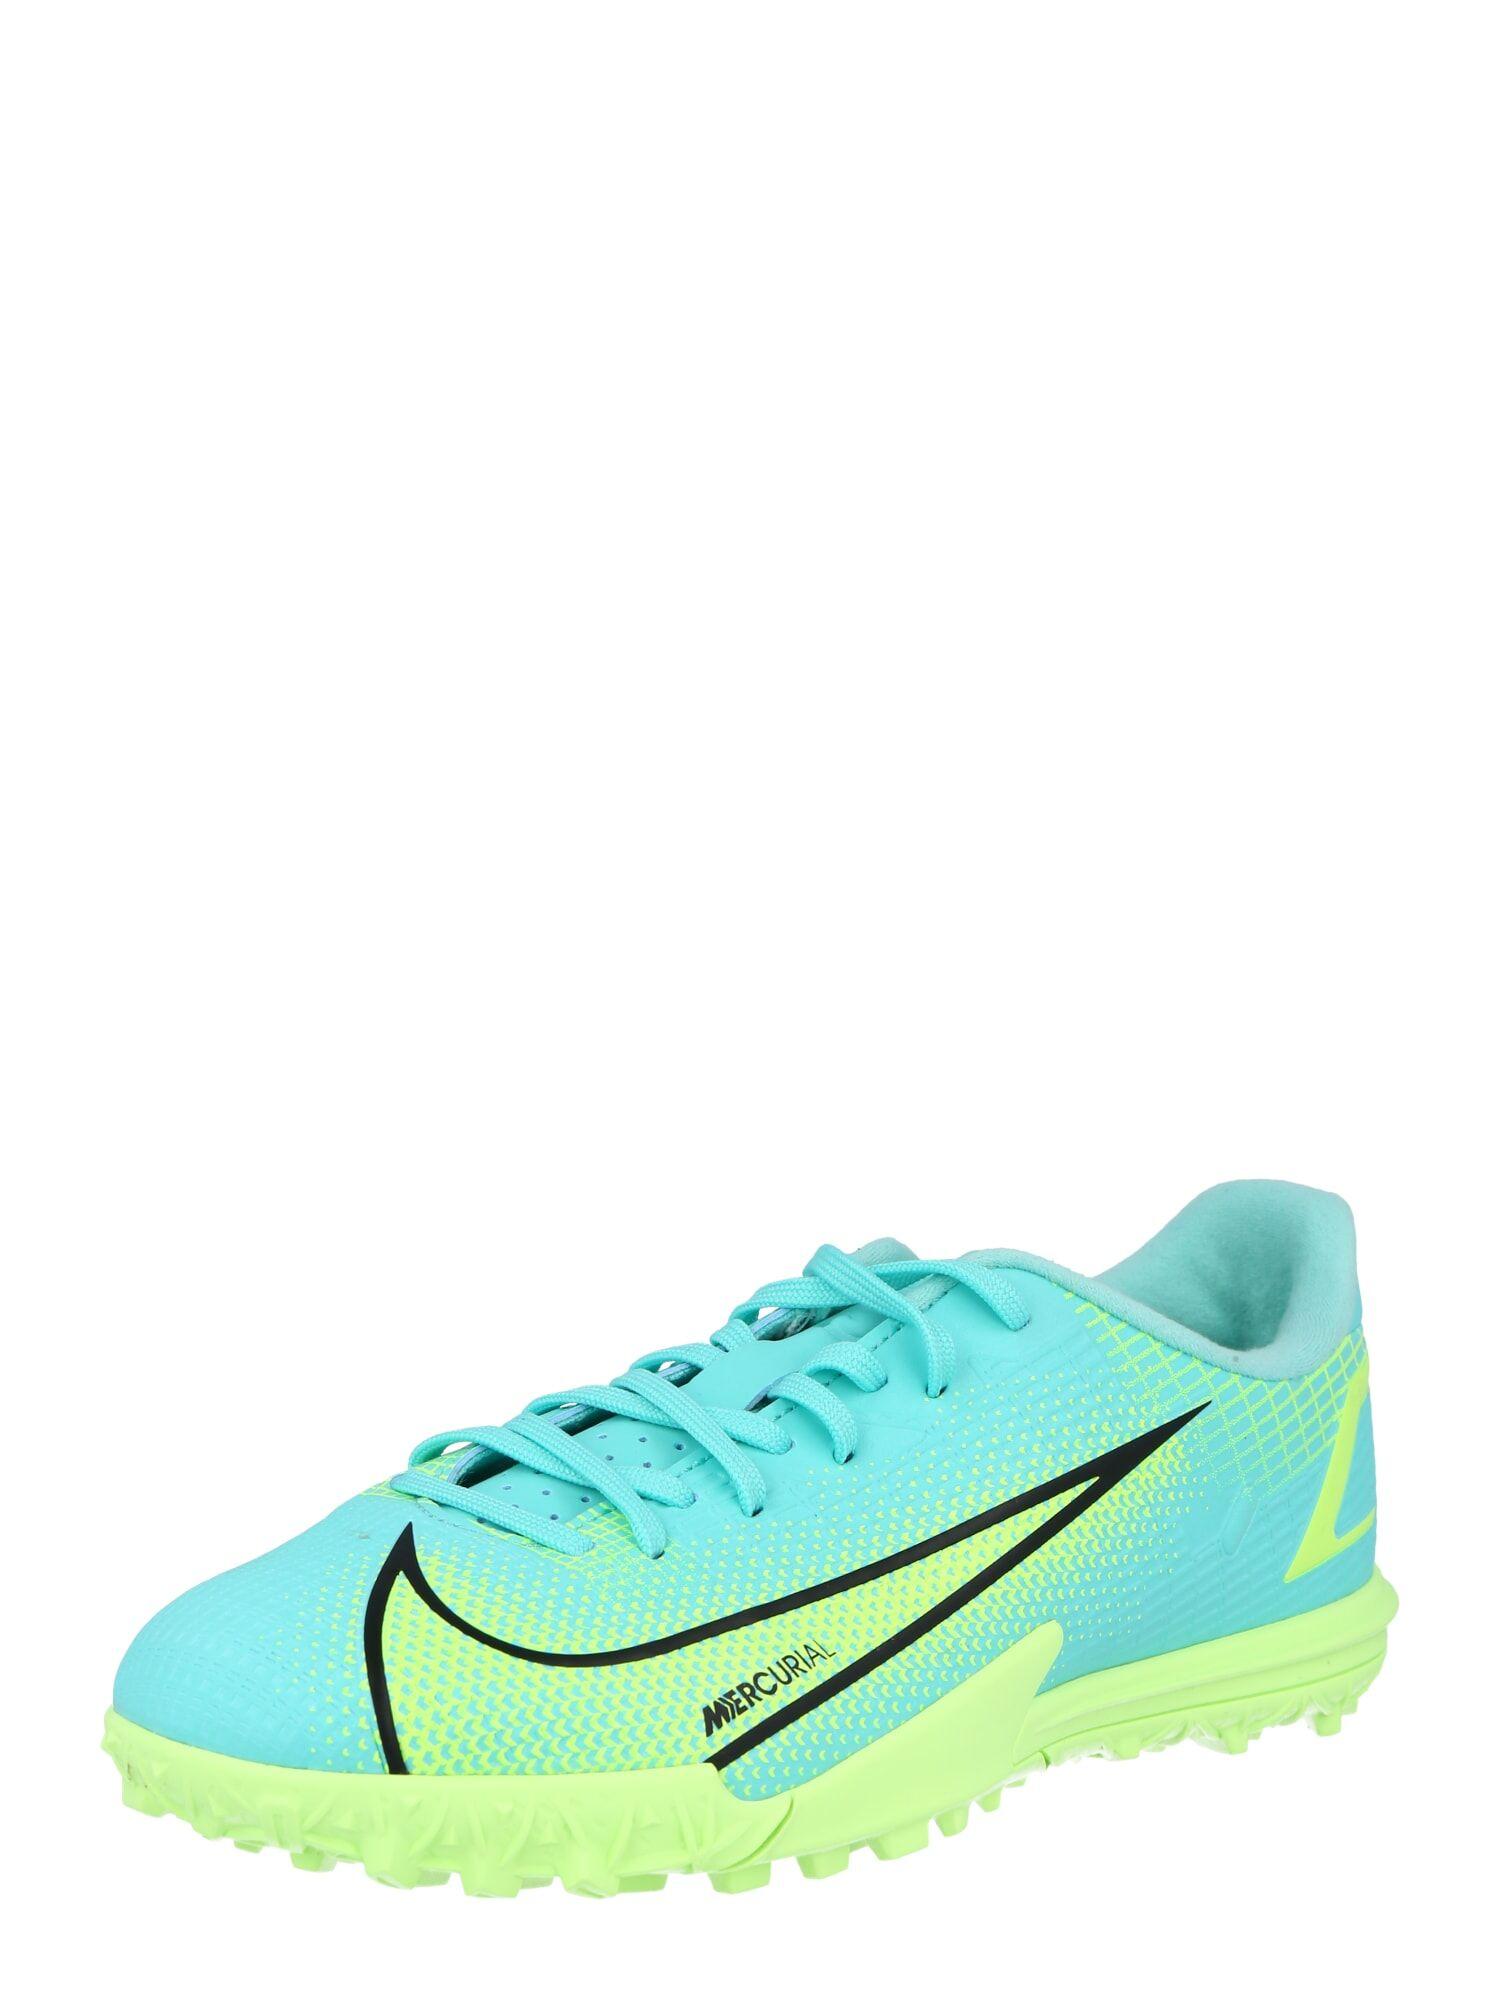 NIKE Scarpa da calcio 'Vapor 14' Blu